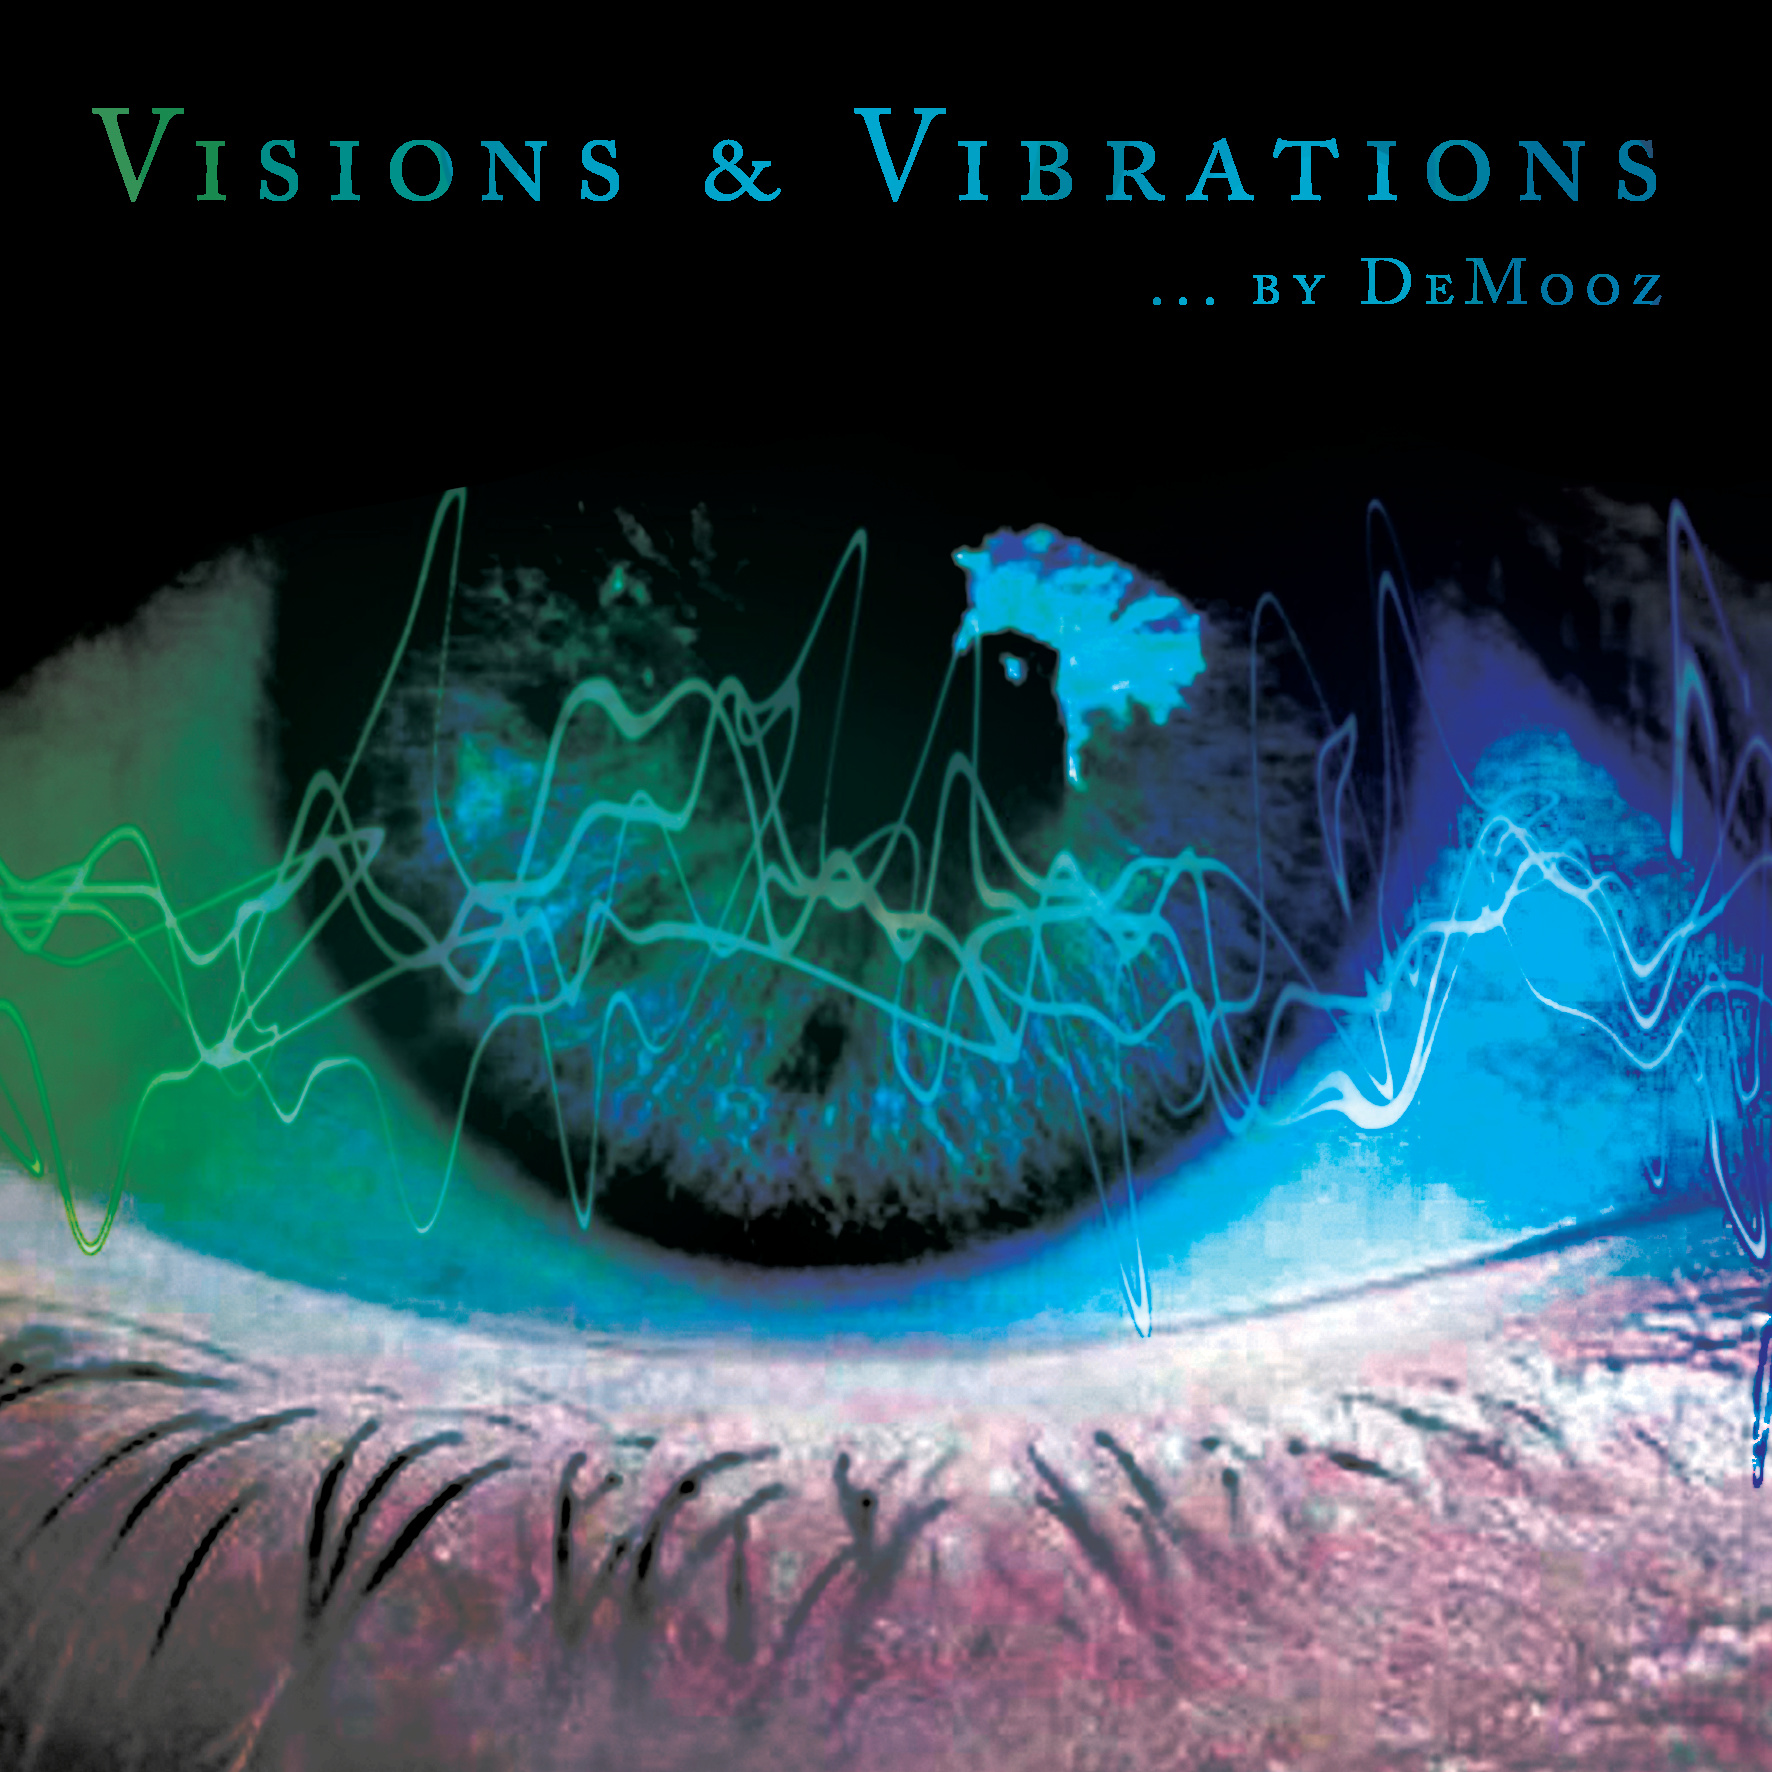 Visions & Vibrations